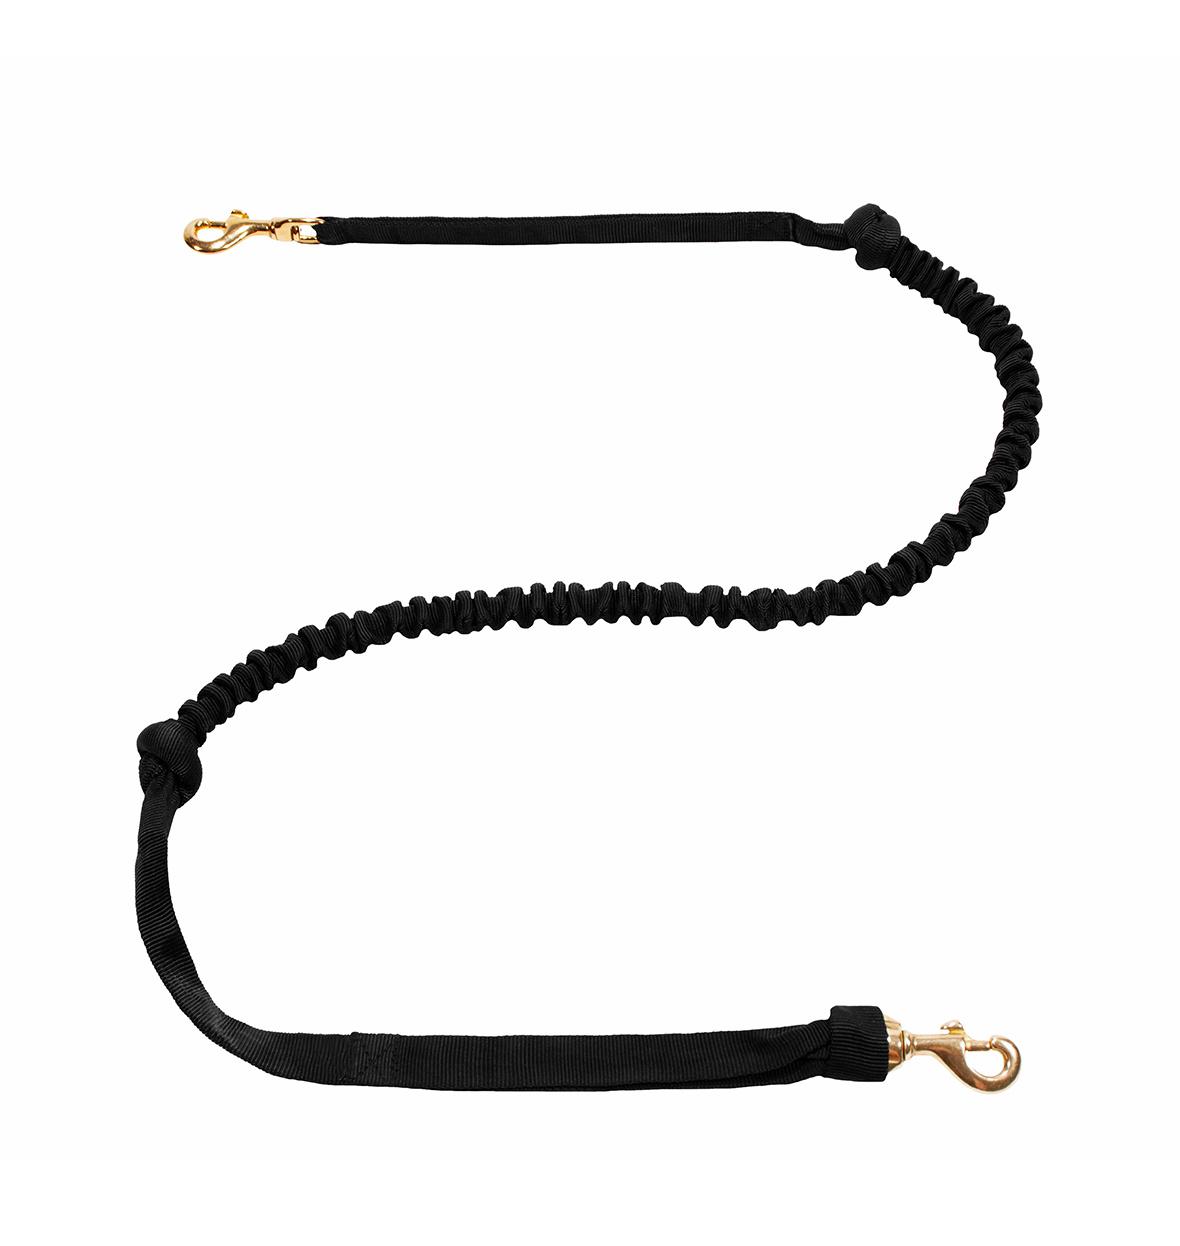 LasaLine Weight Pulling Dog Harness, X - Back Style - Blue Neonyellow + Leash - Copy